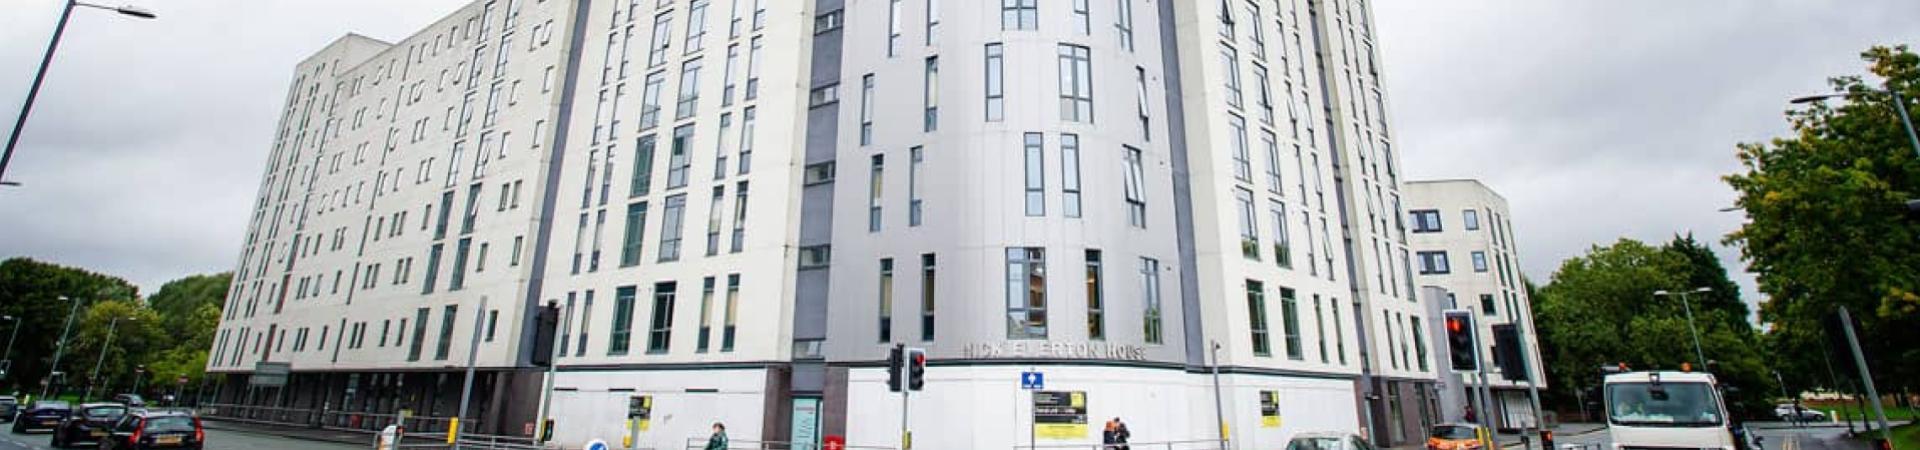 exterior of Grafton Street